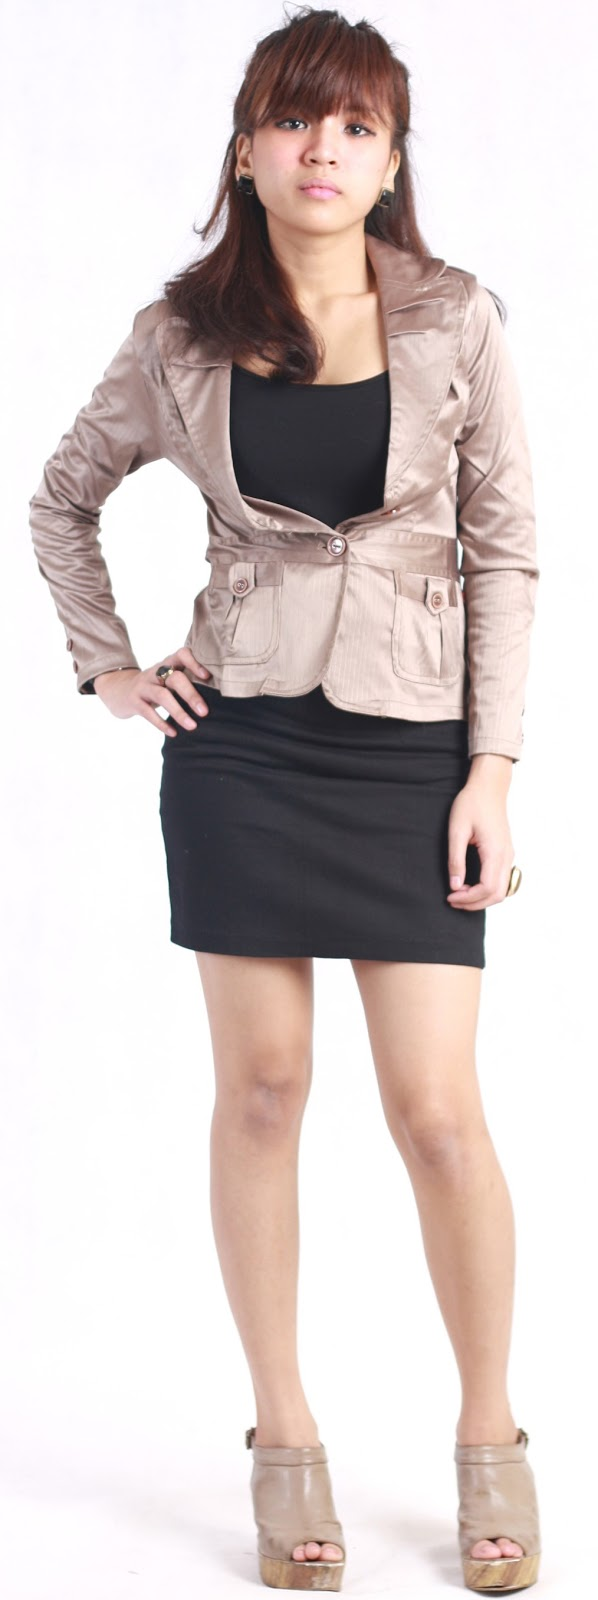 news.com/2012/12/model-blazer-terbaru.html . Jangan lupa share ke